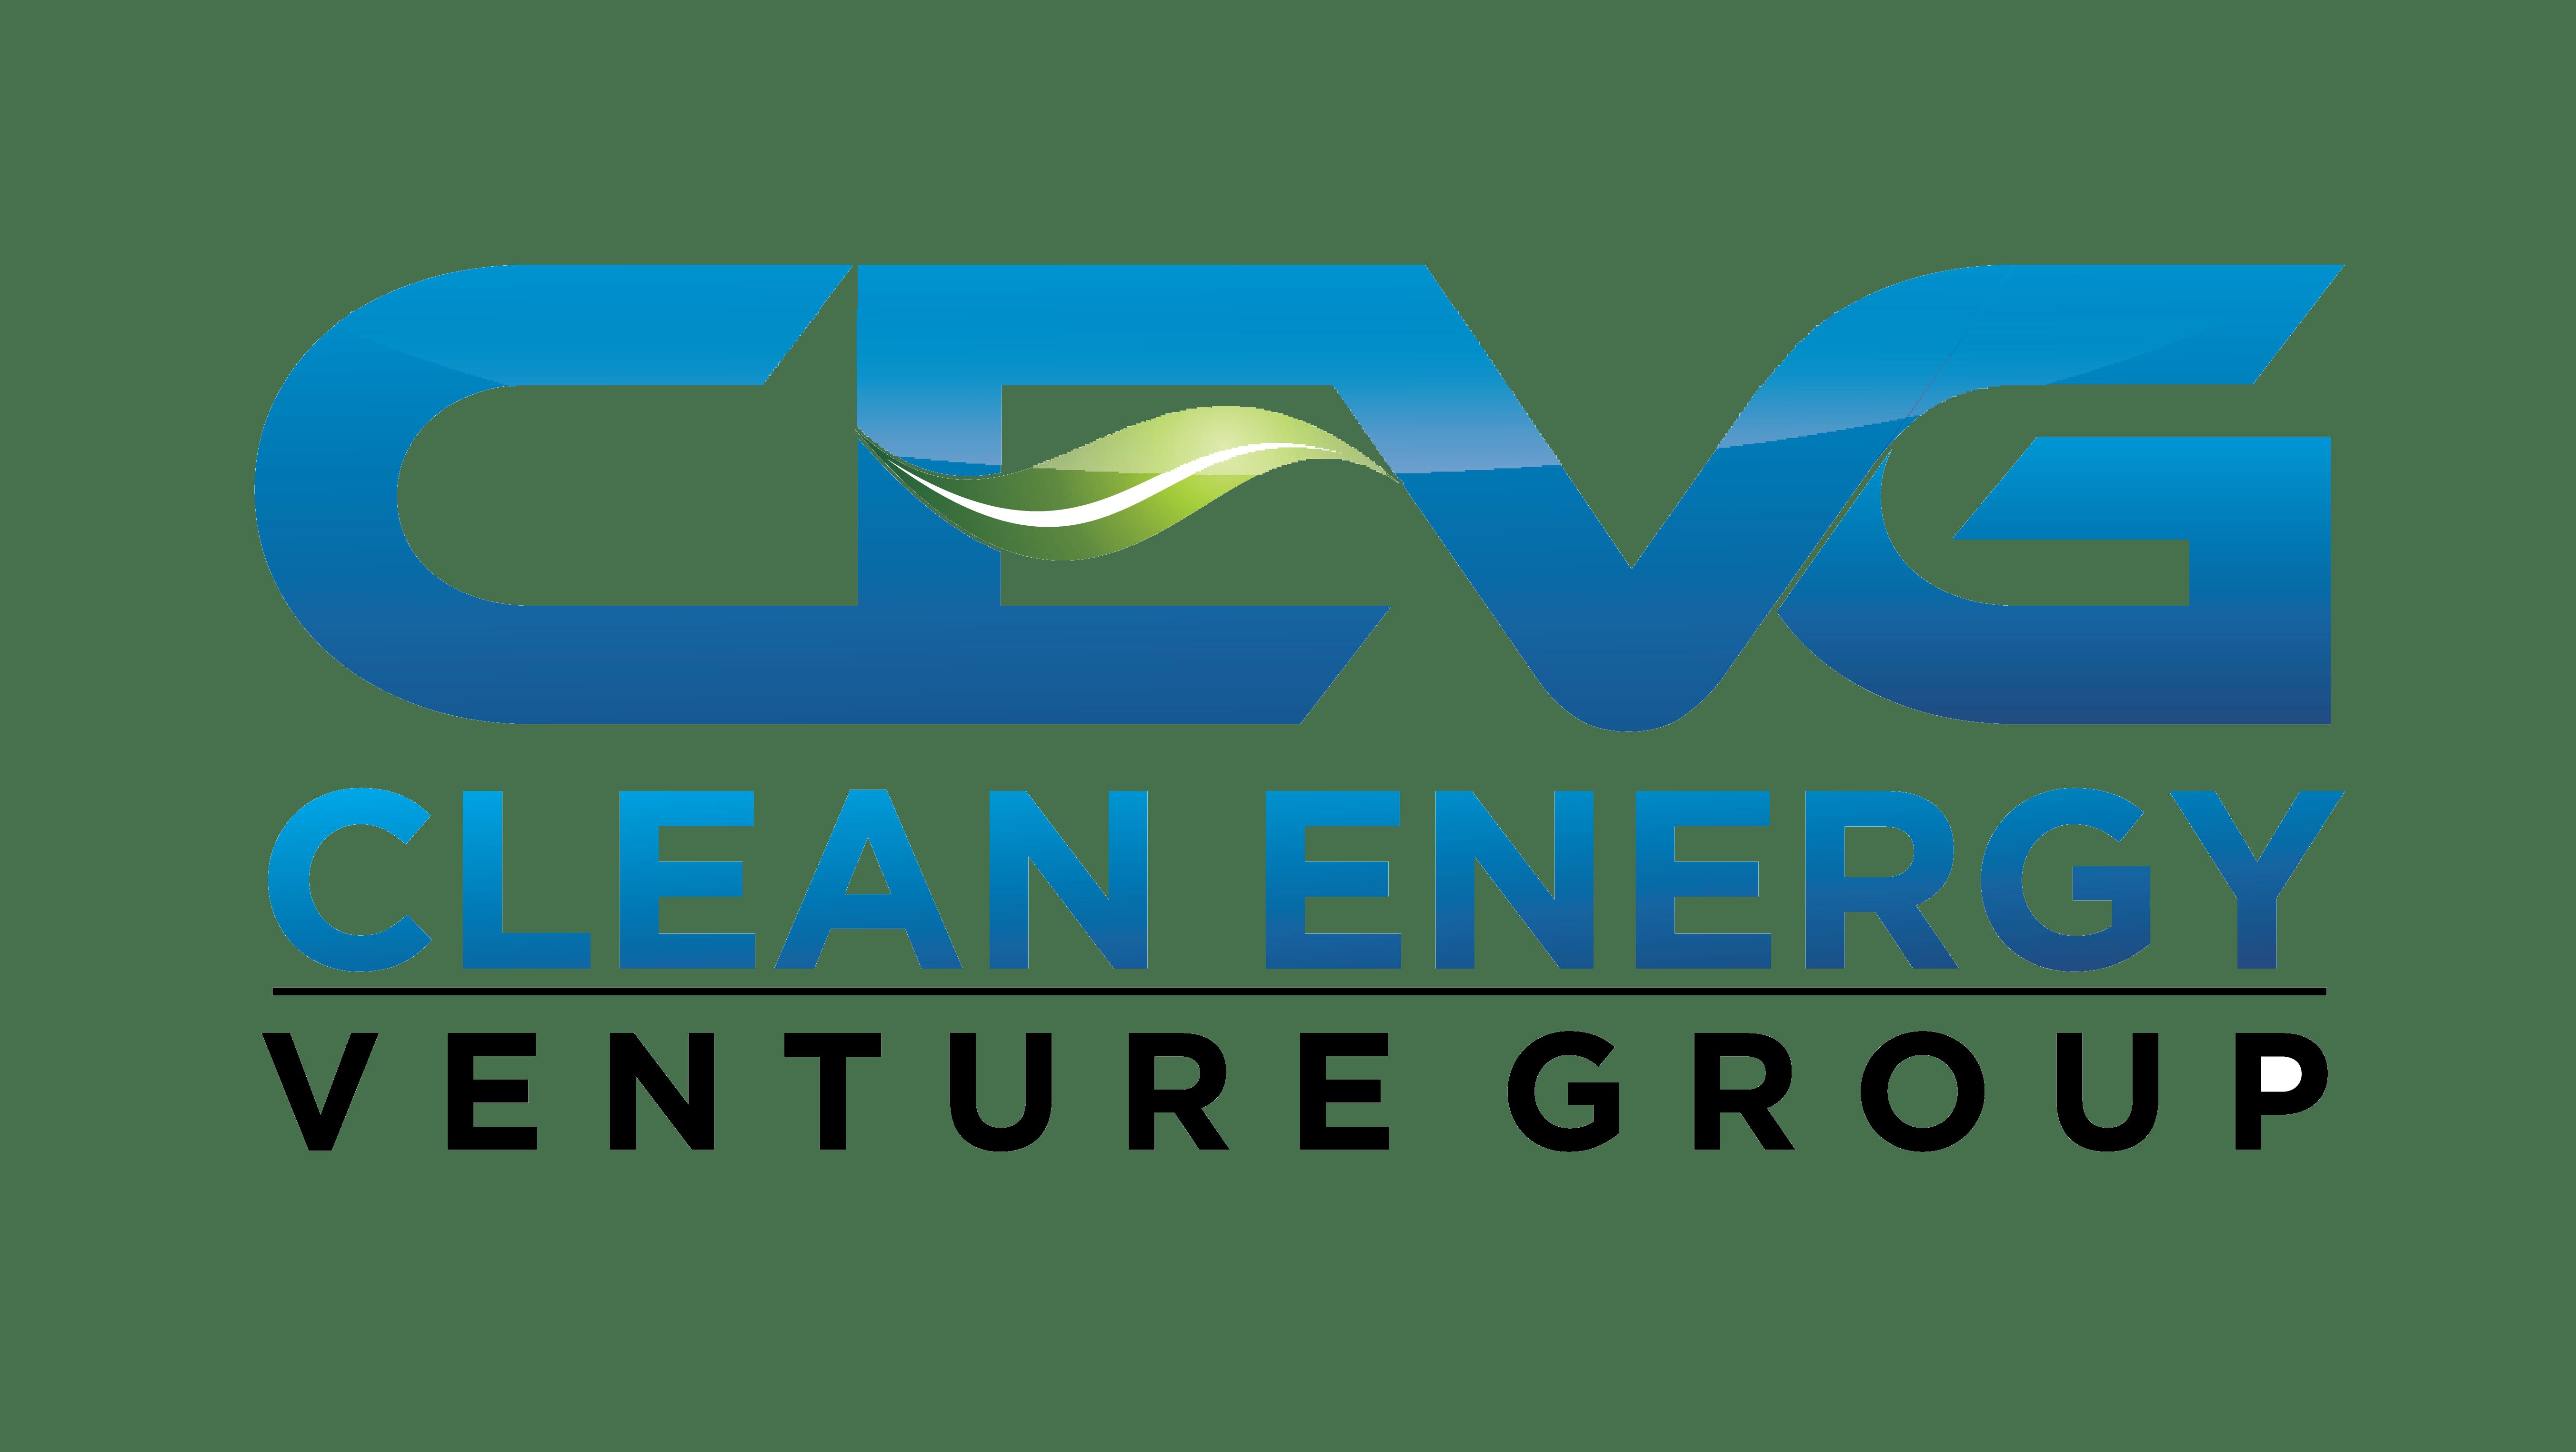 Clean Energy Venture Group